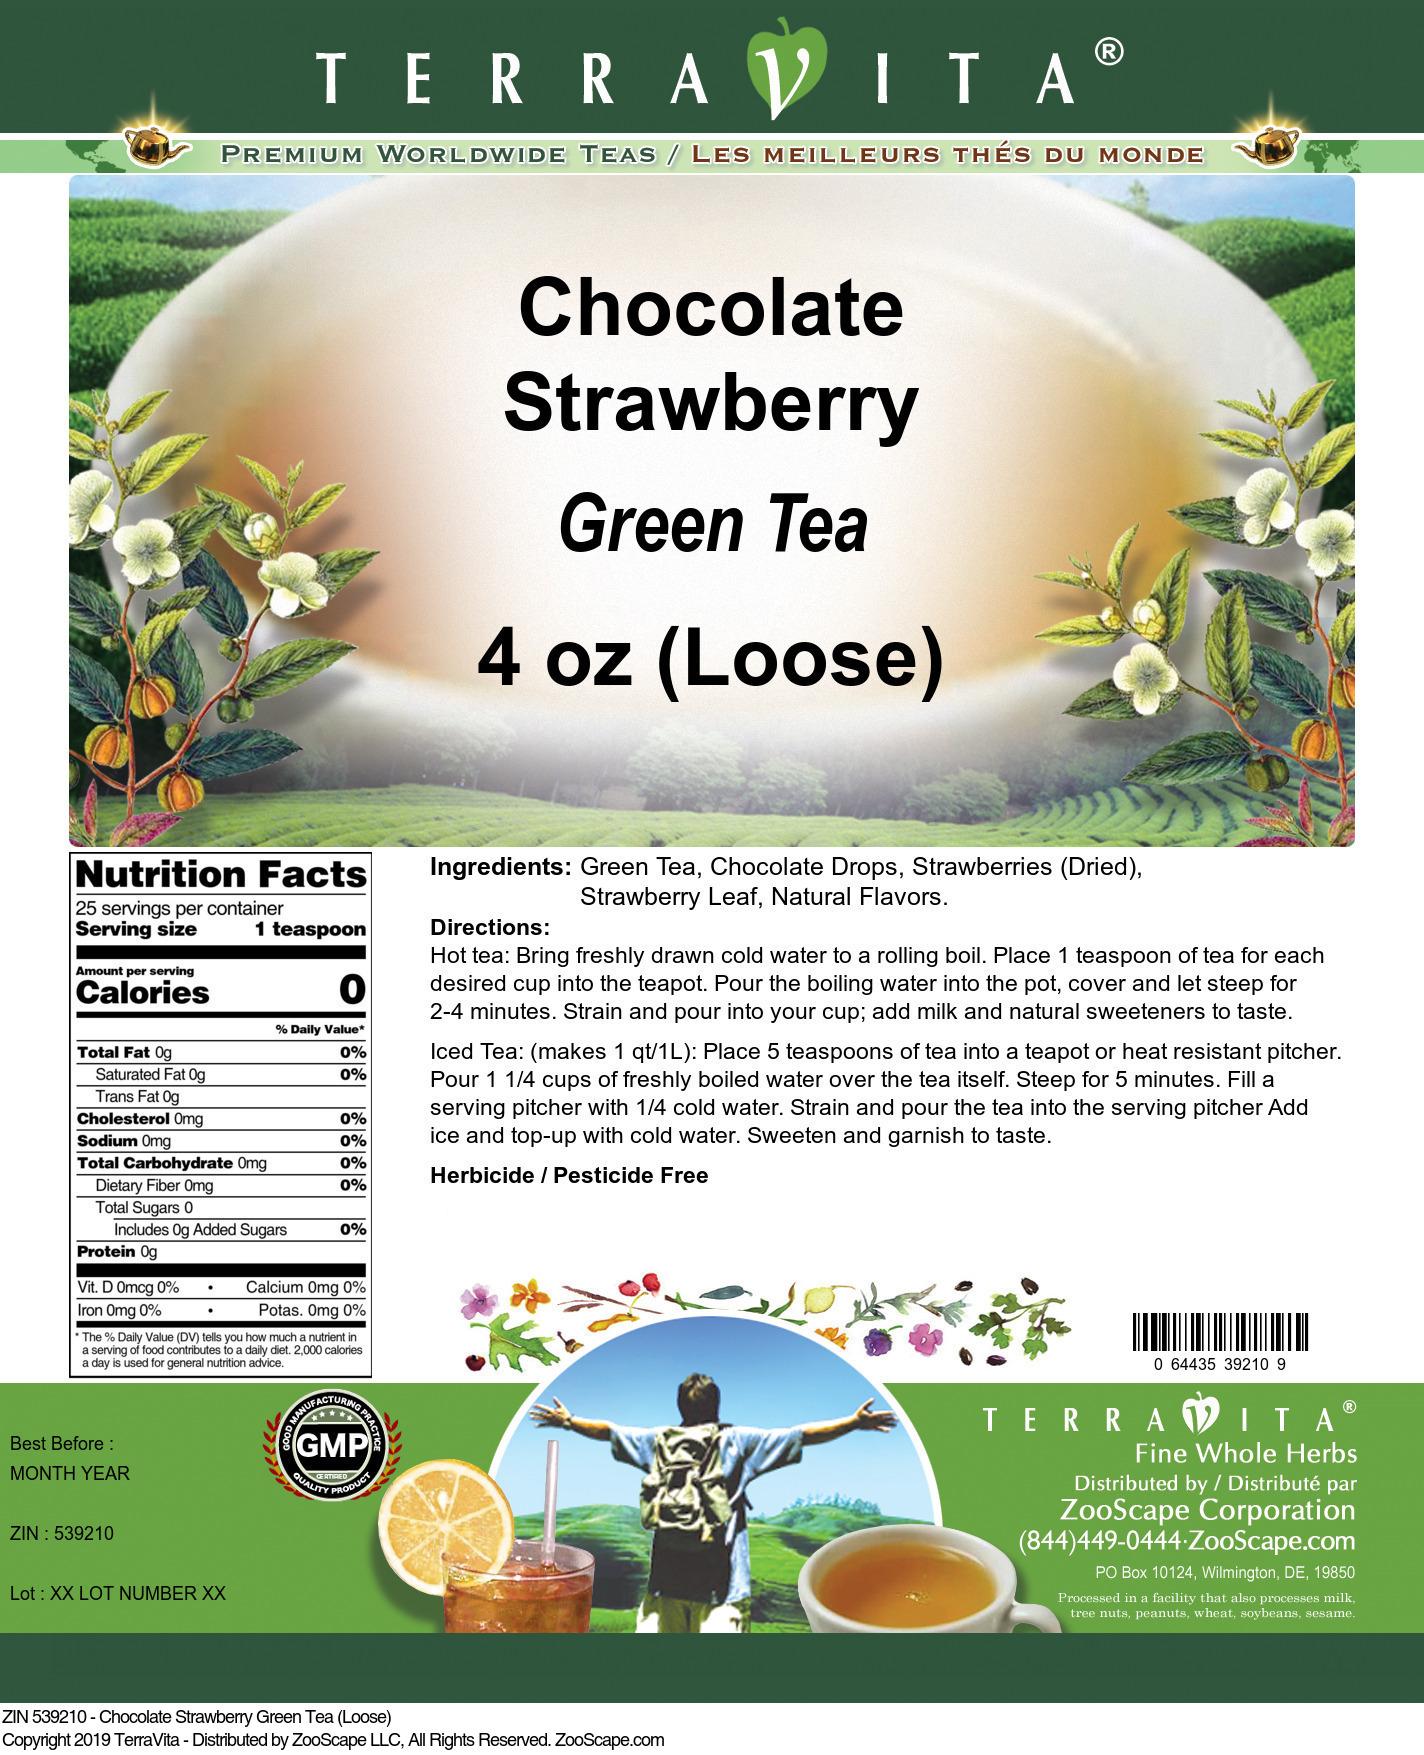 Chocolate Strawberry Green Tea (Loose)